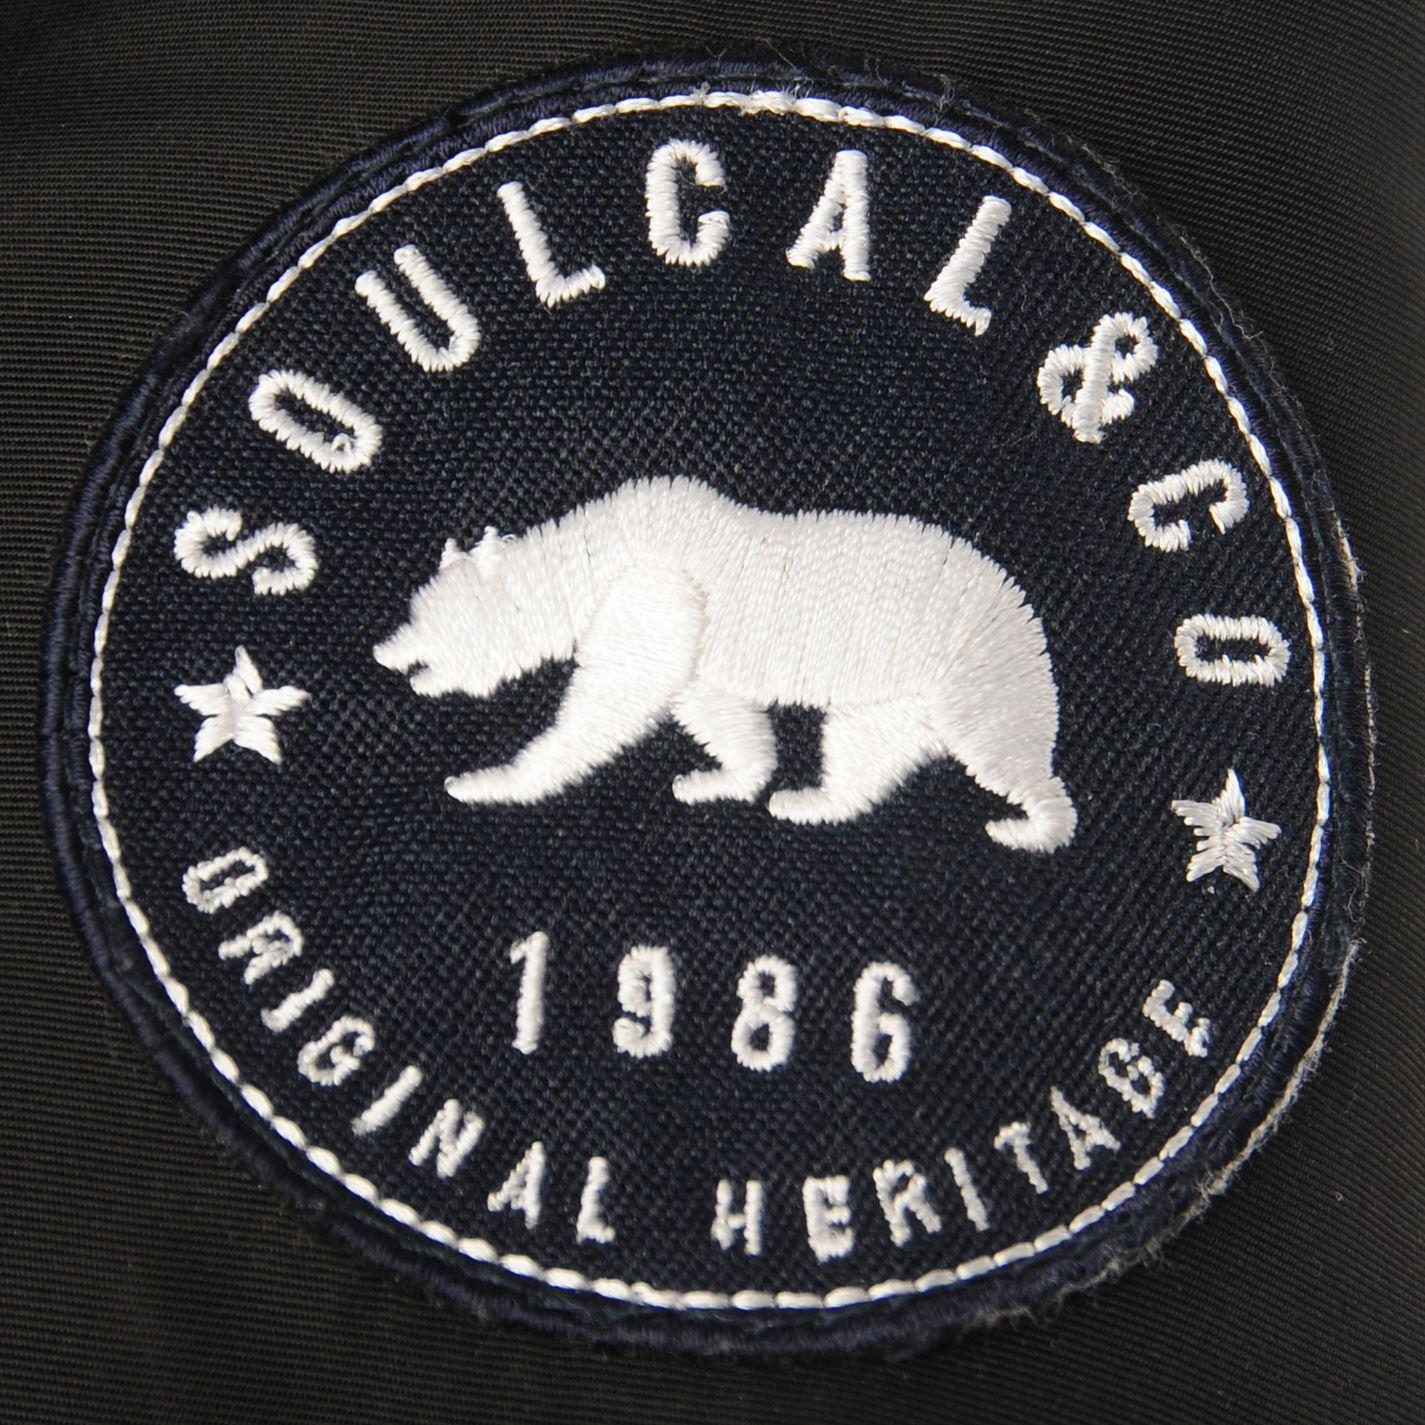 Mens-SoulCal-2-Zip-Bubble-Jacket-Padded-New thumbnail 21